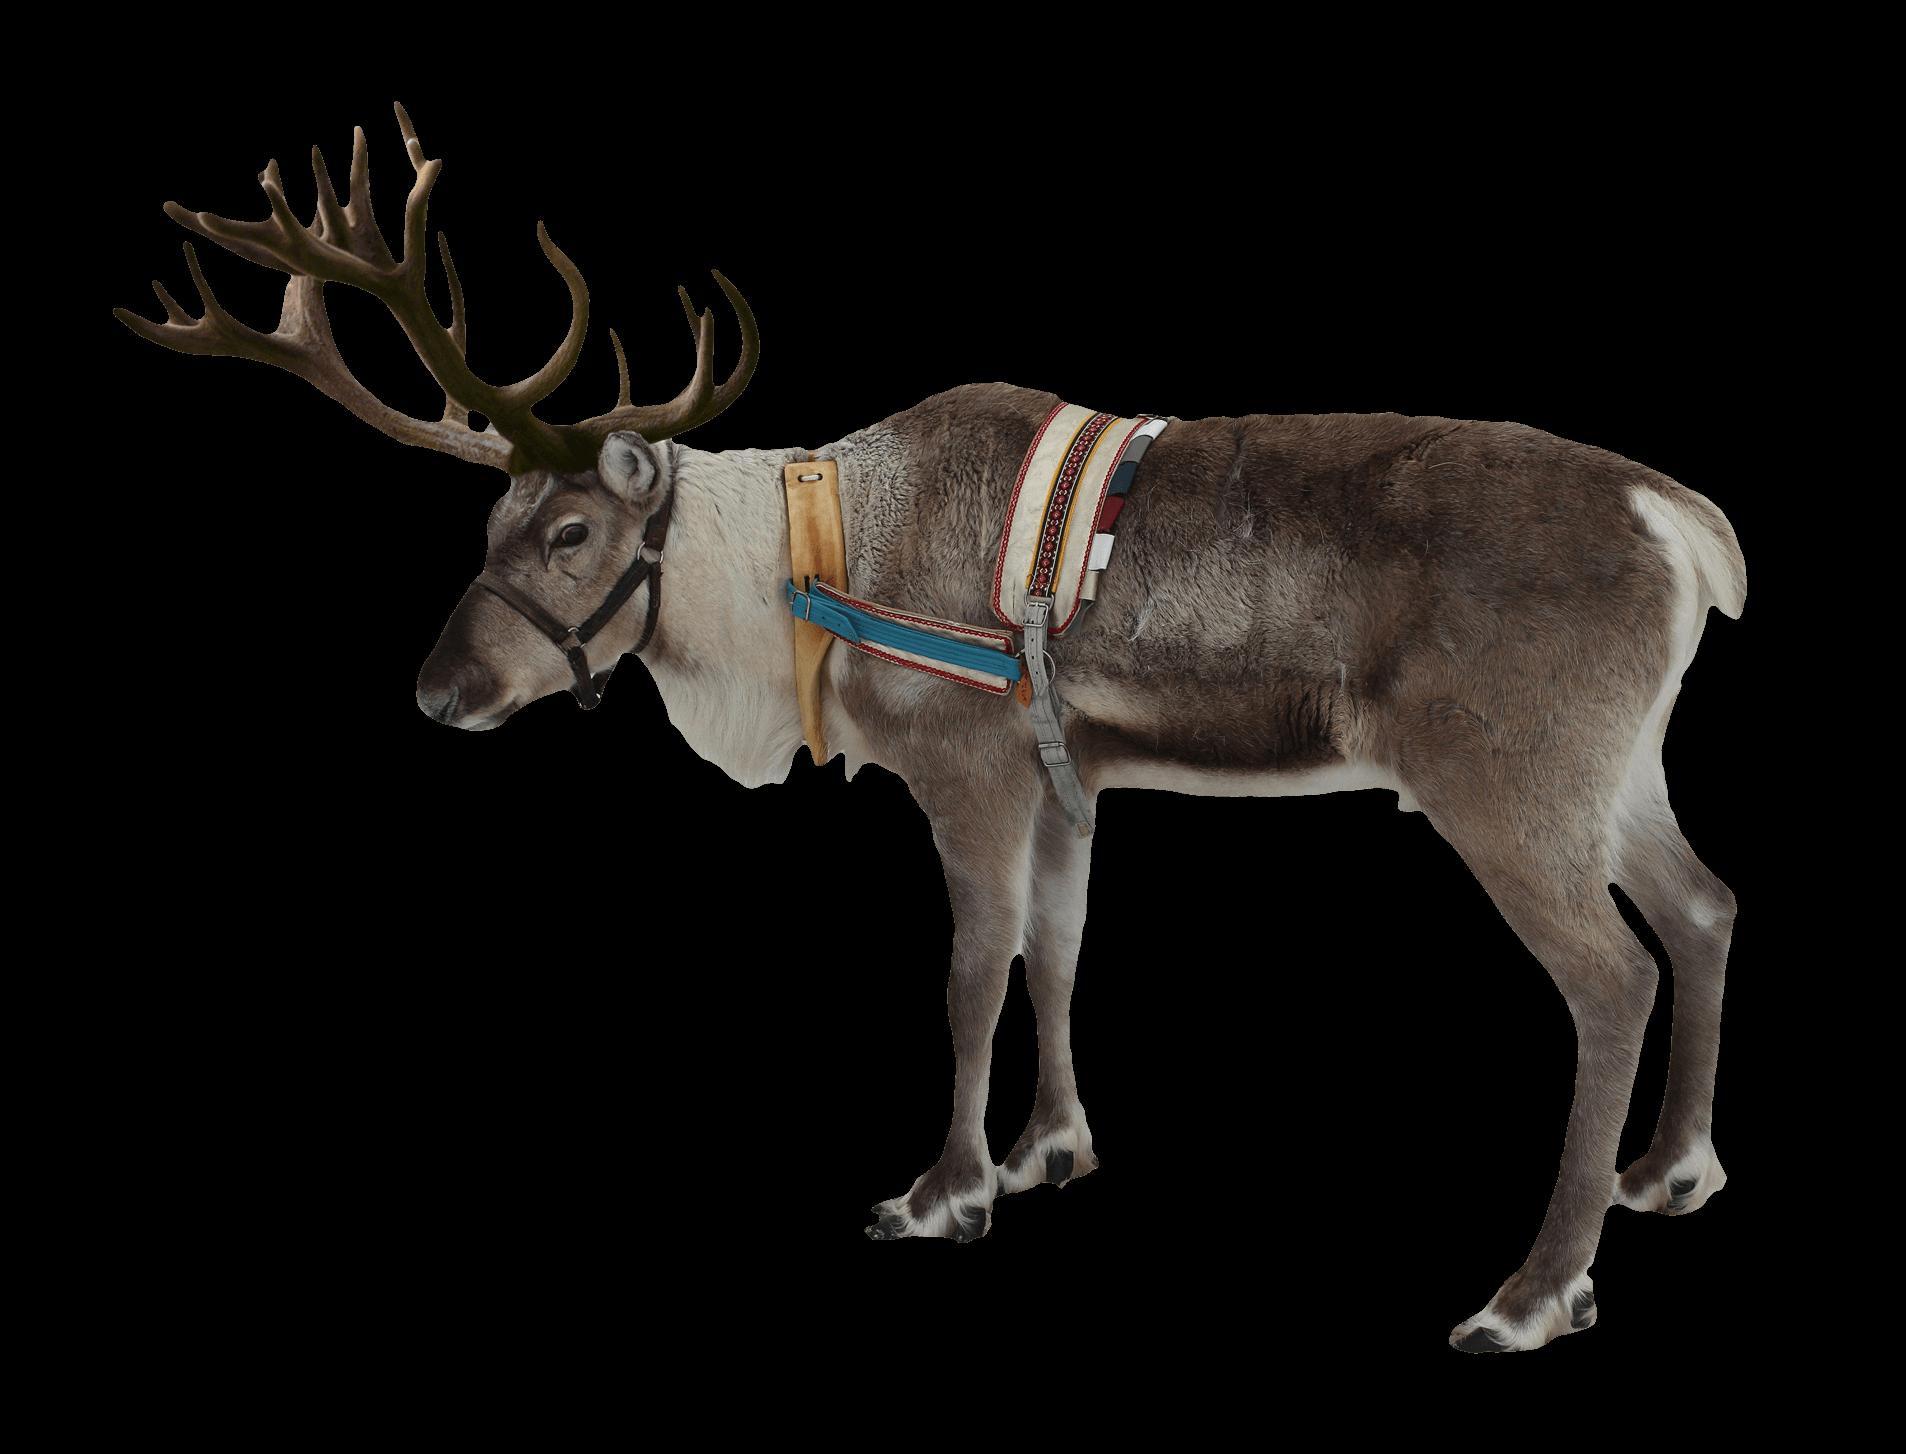 Christmas Reindeer Png.Reindeer Christmas Transparent Png Stickpng